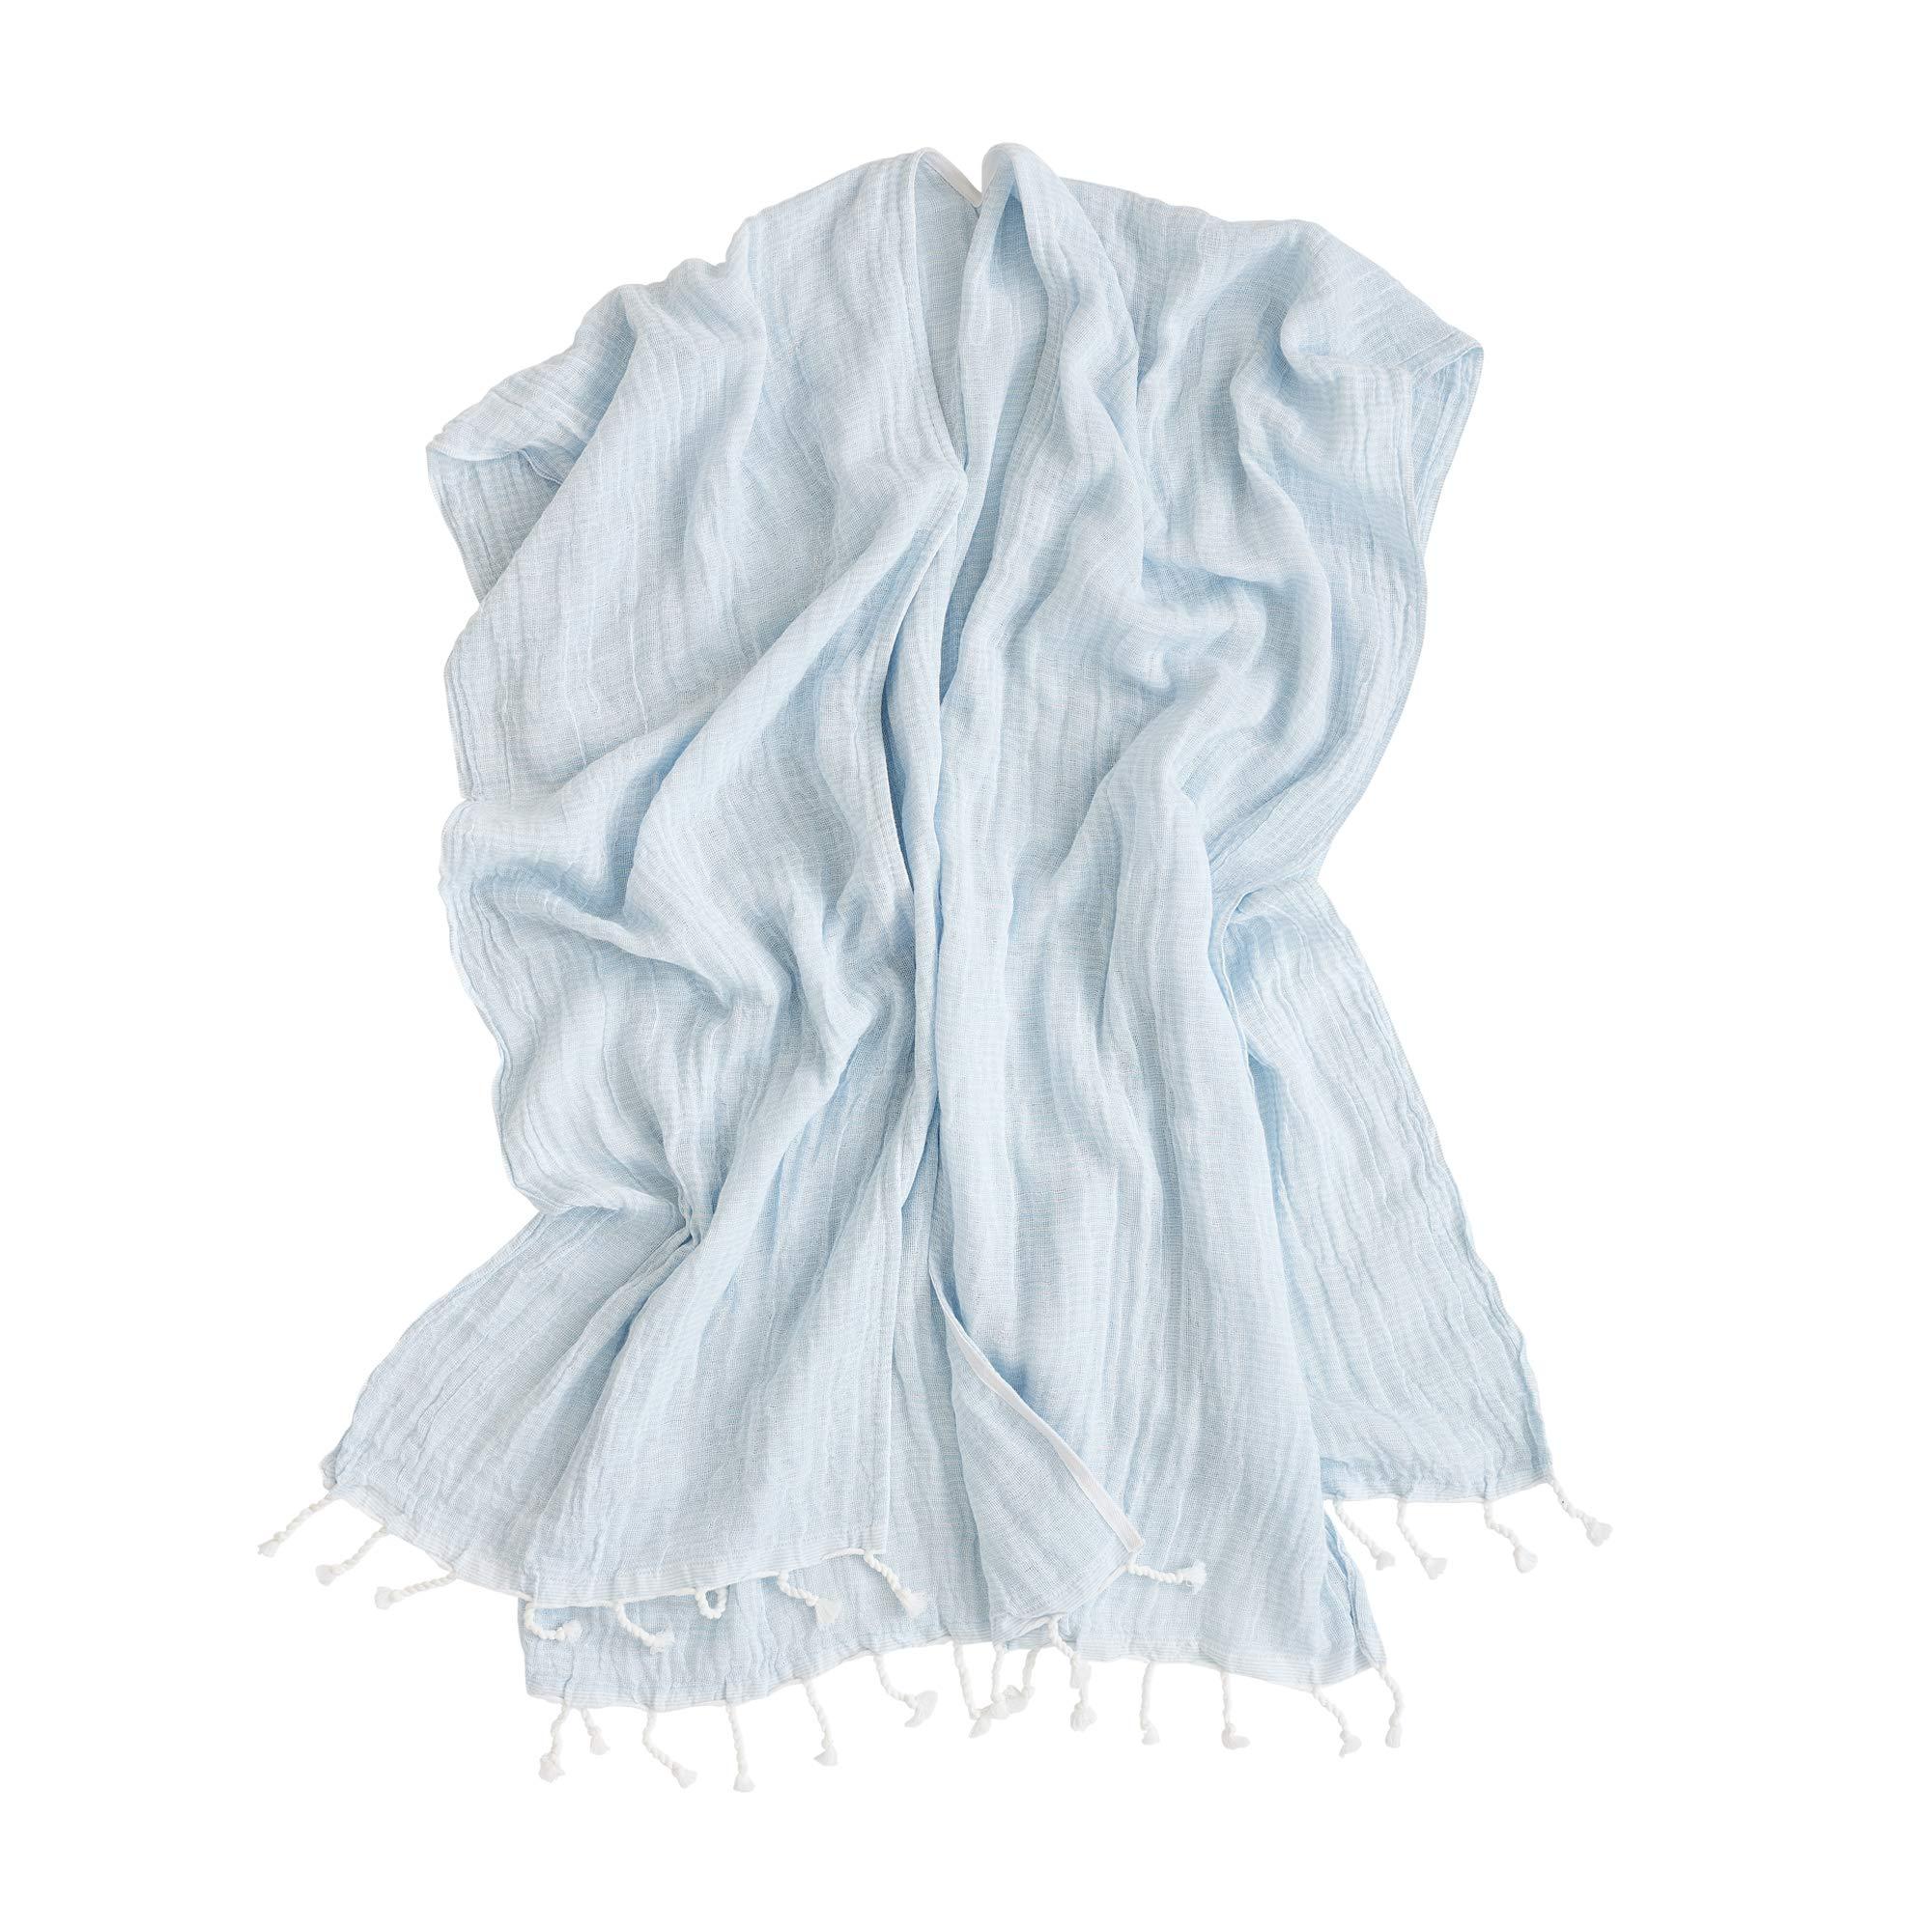 Mer Sea & Co Luxury Beach Wrap with Tote Bag - Light Blue Stripes - 100% Cotton (43'' x 65'')